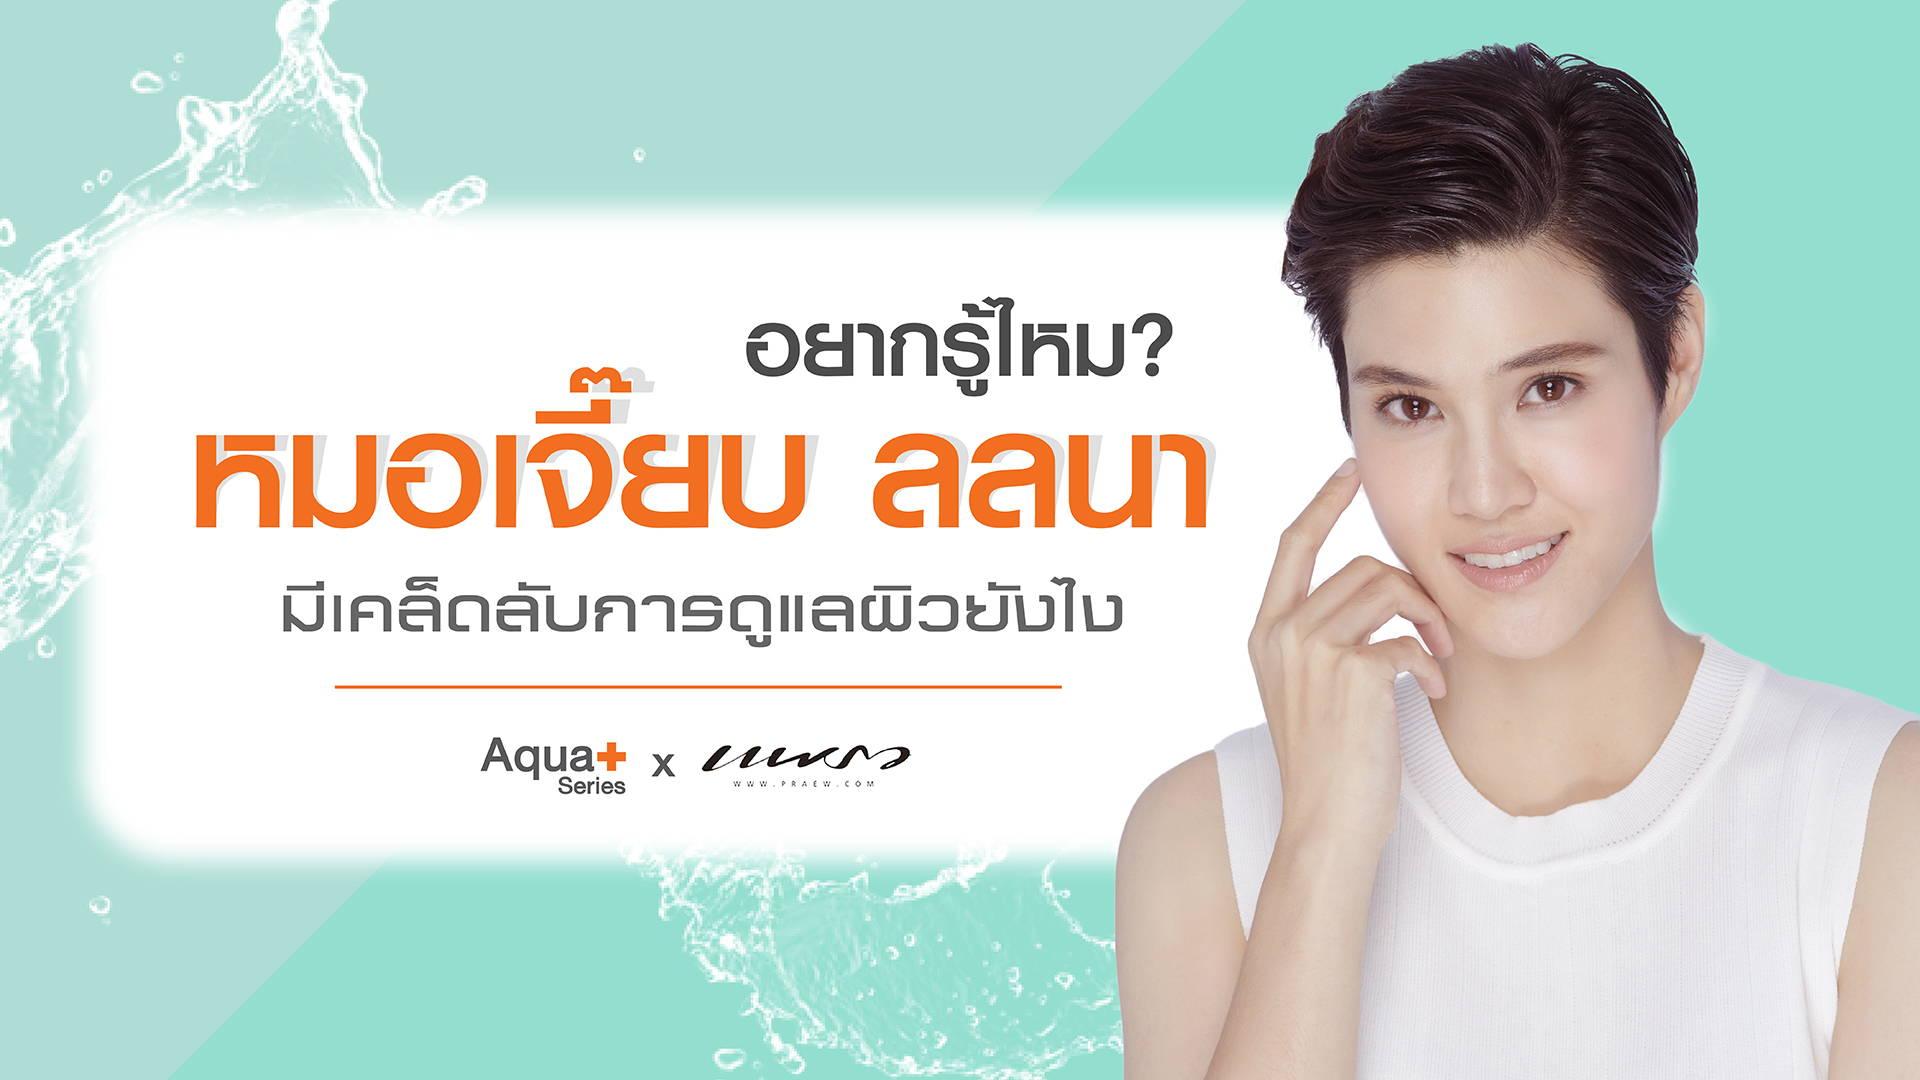 Skincare News